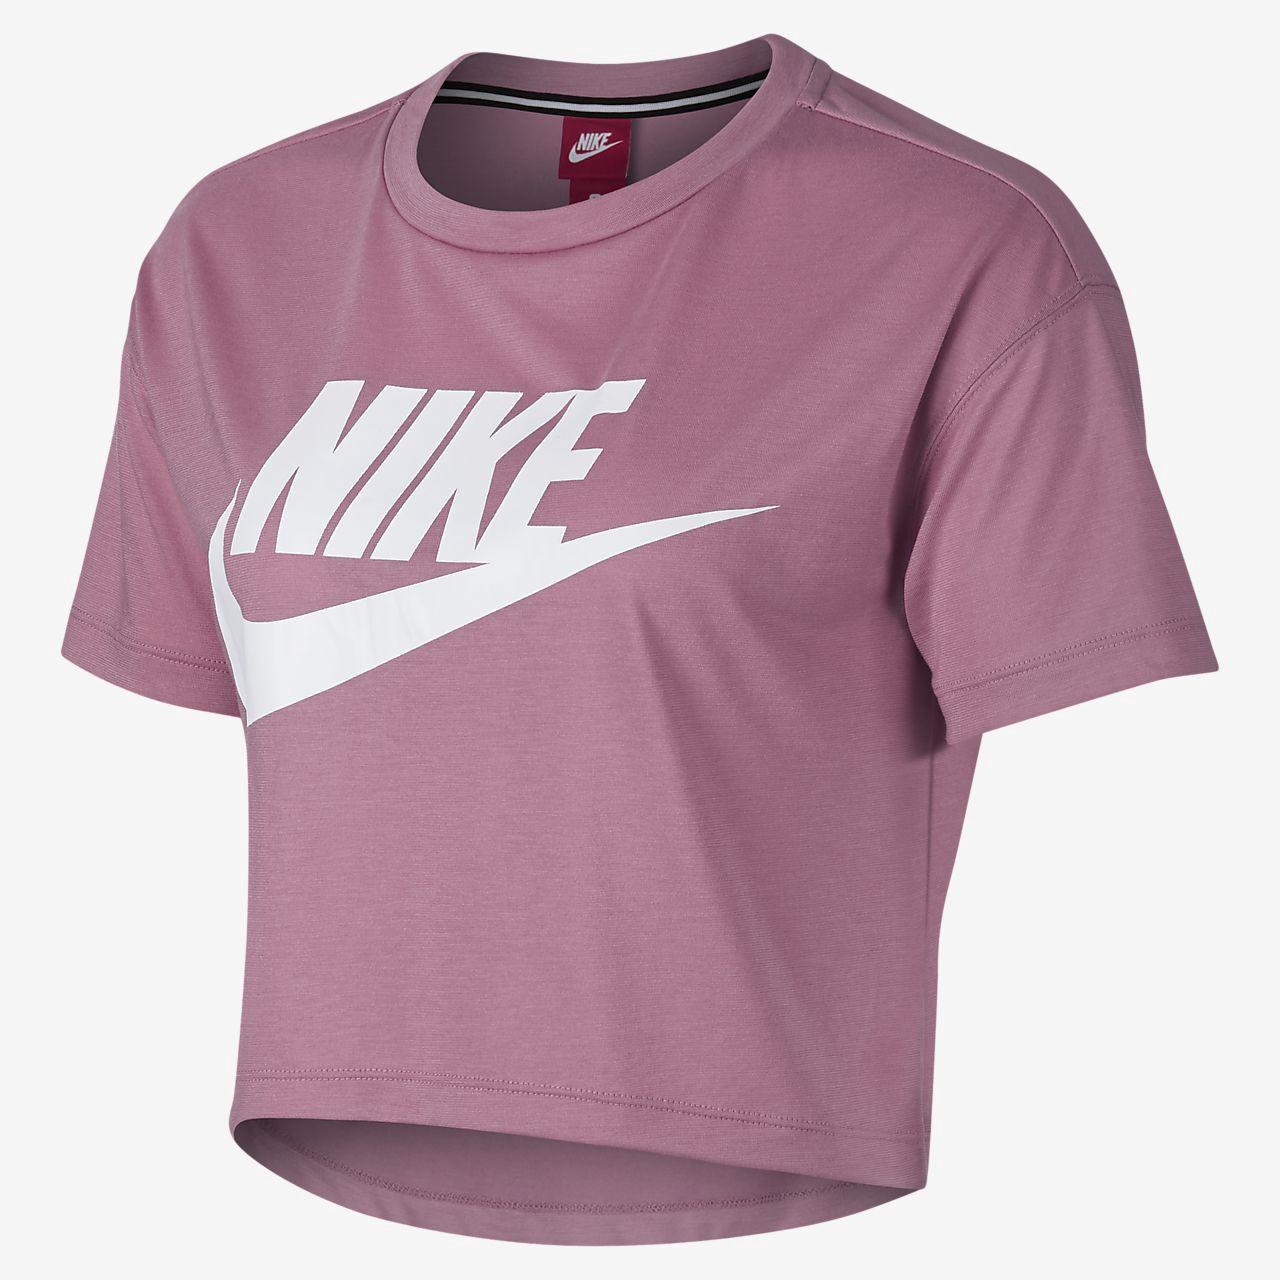 Nike Essential Cropped Women S Short Sleeve Top Xl 16 18 Nike Shirts Women Nike T Shirts Women S Nike Shirts Women S [ 1280 x 1280 Pixel ]